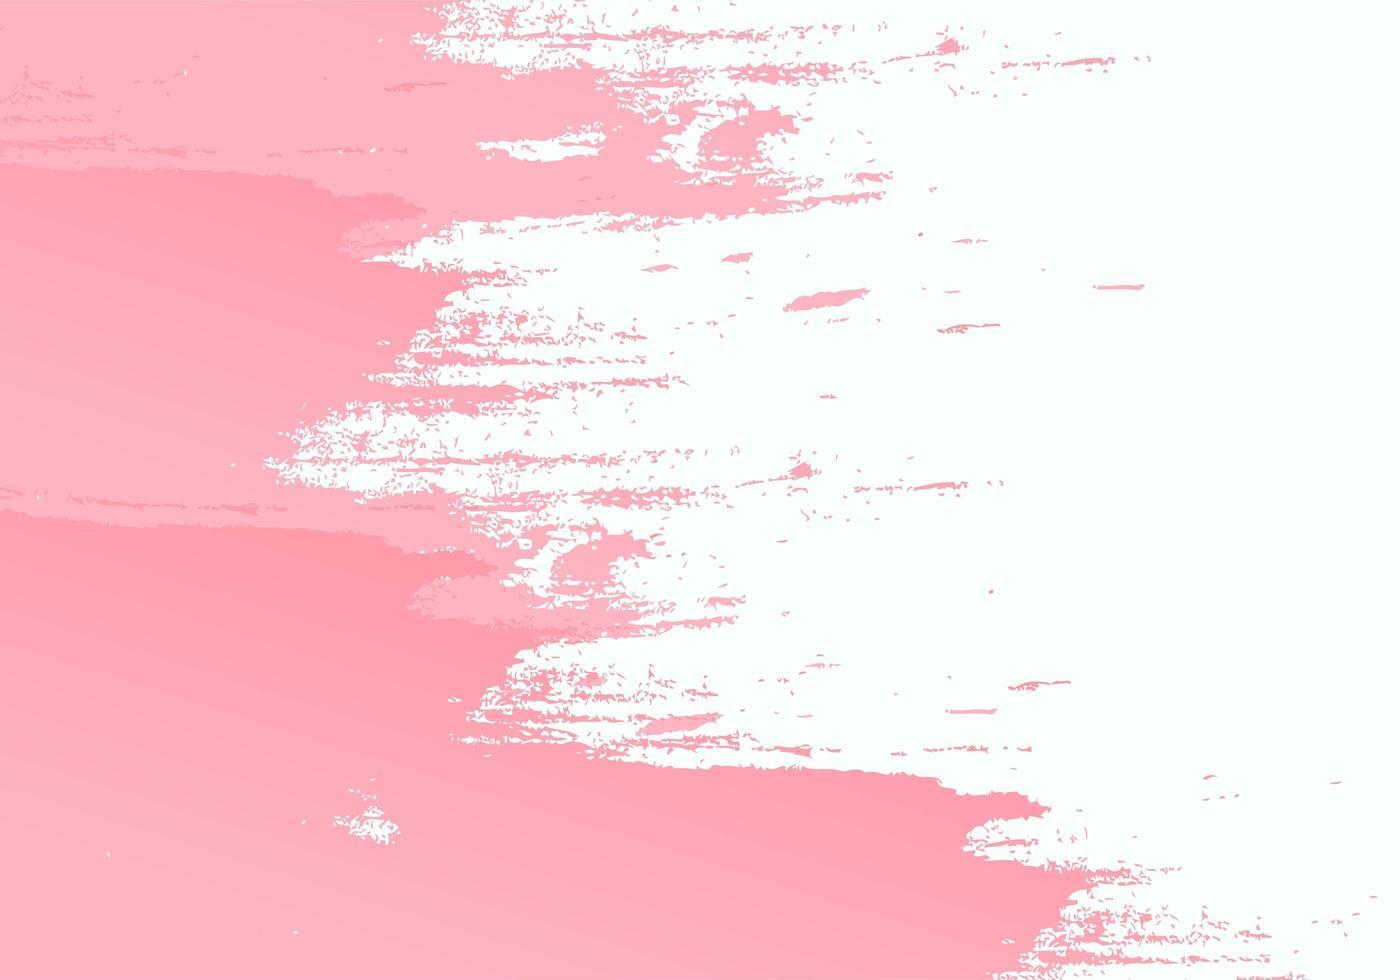 rosa Pinselstrich Textur vektor